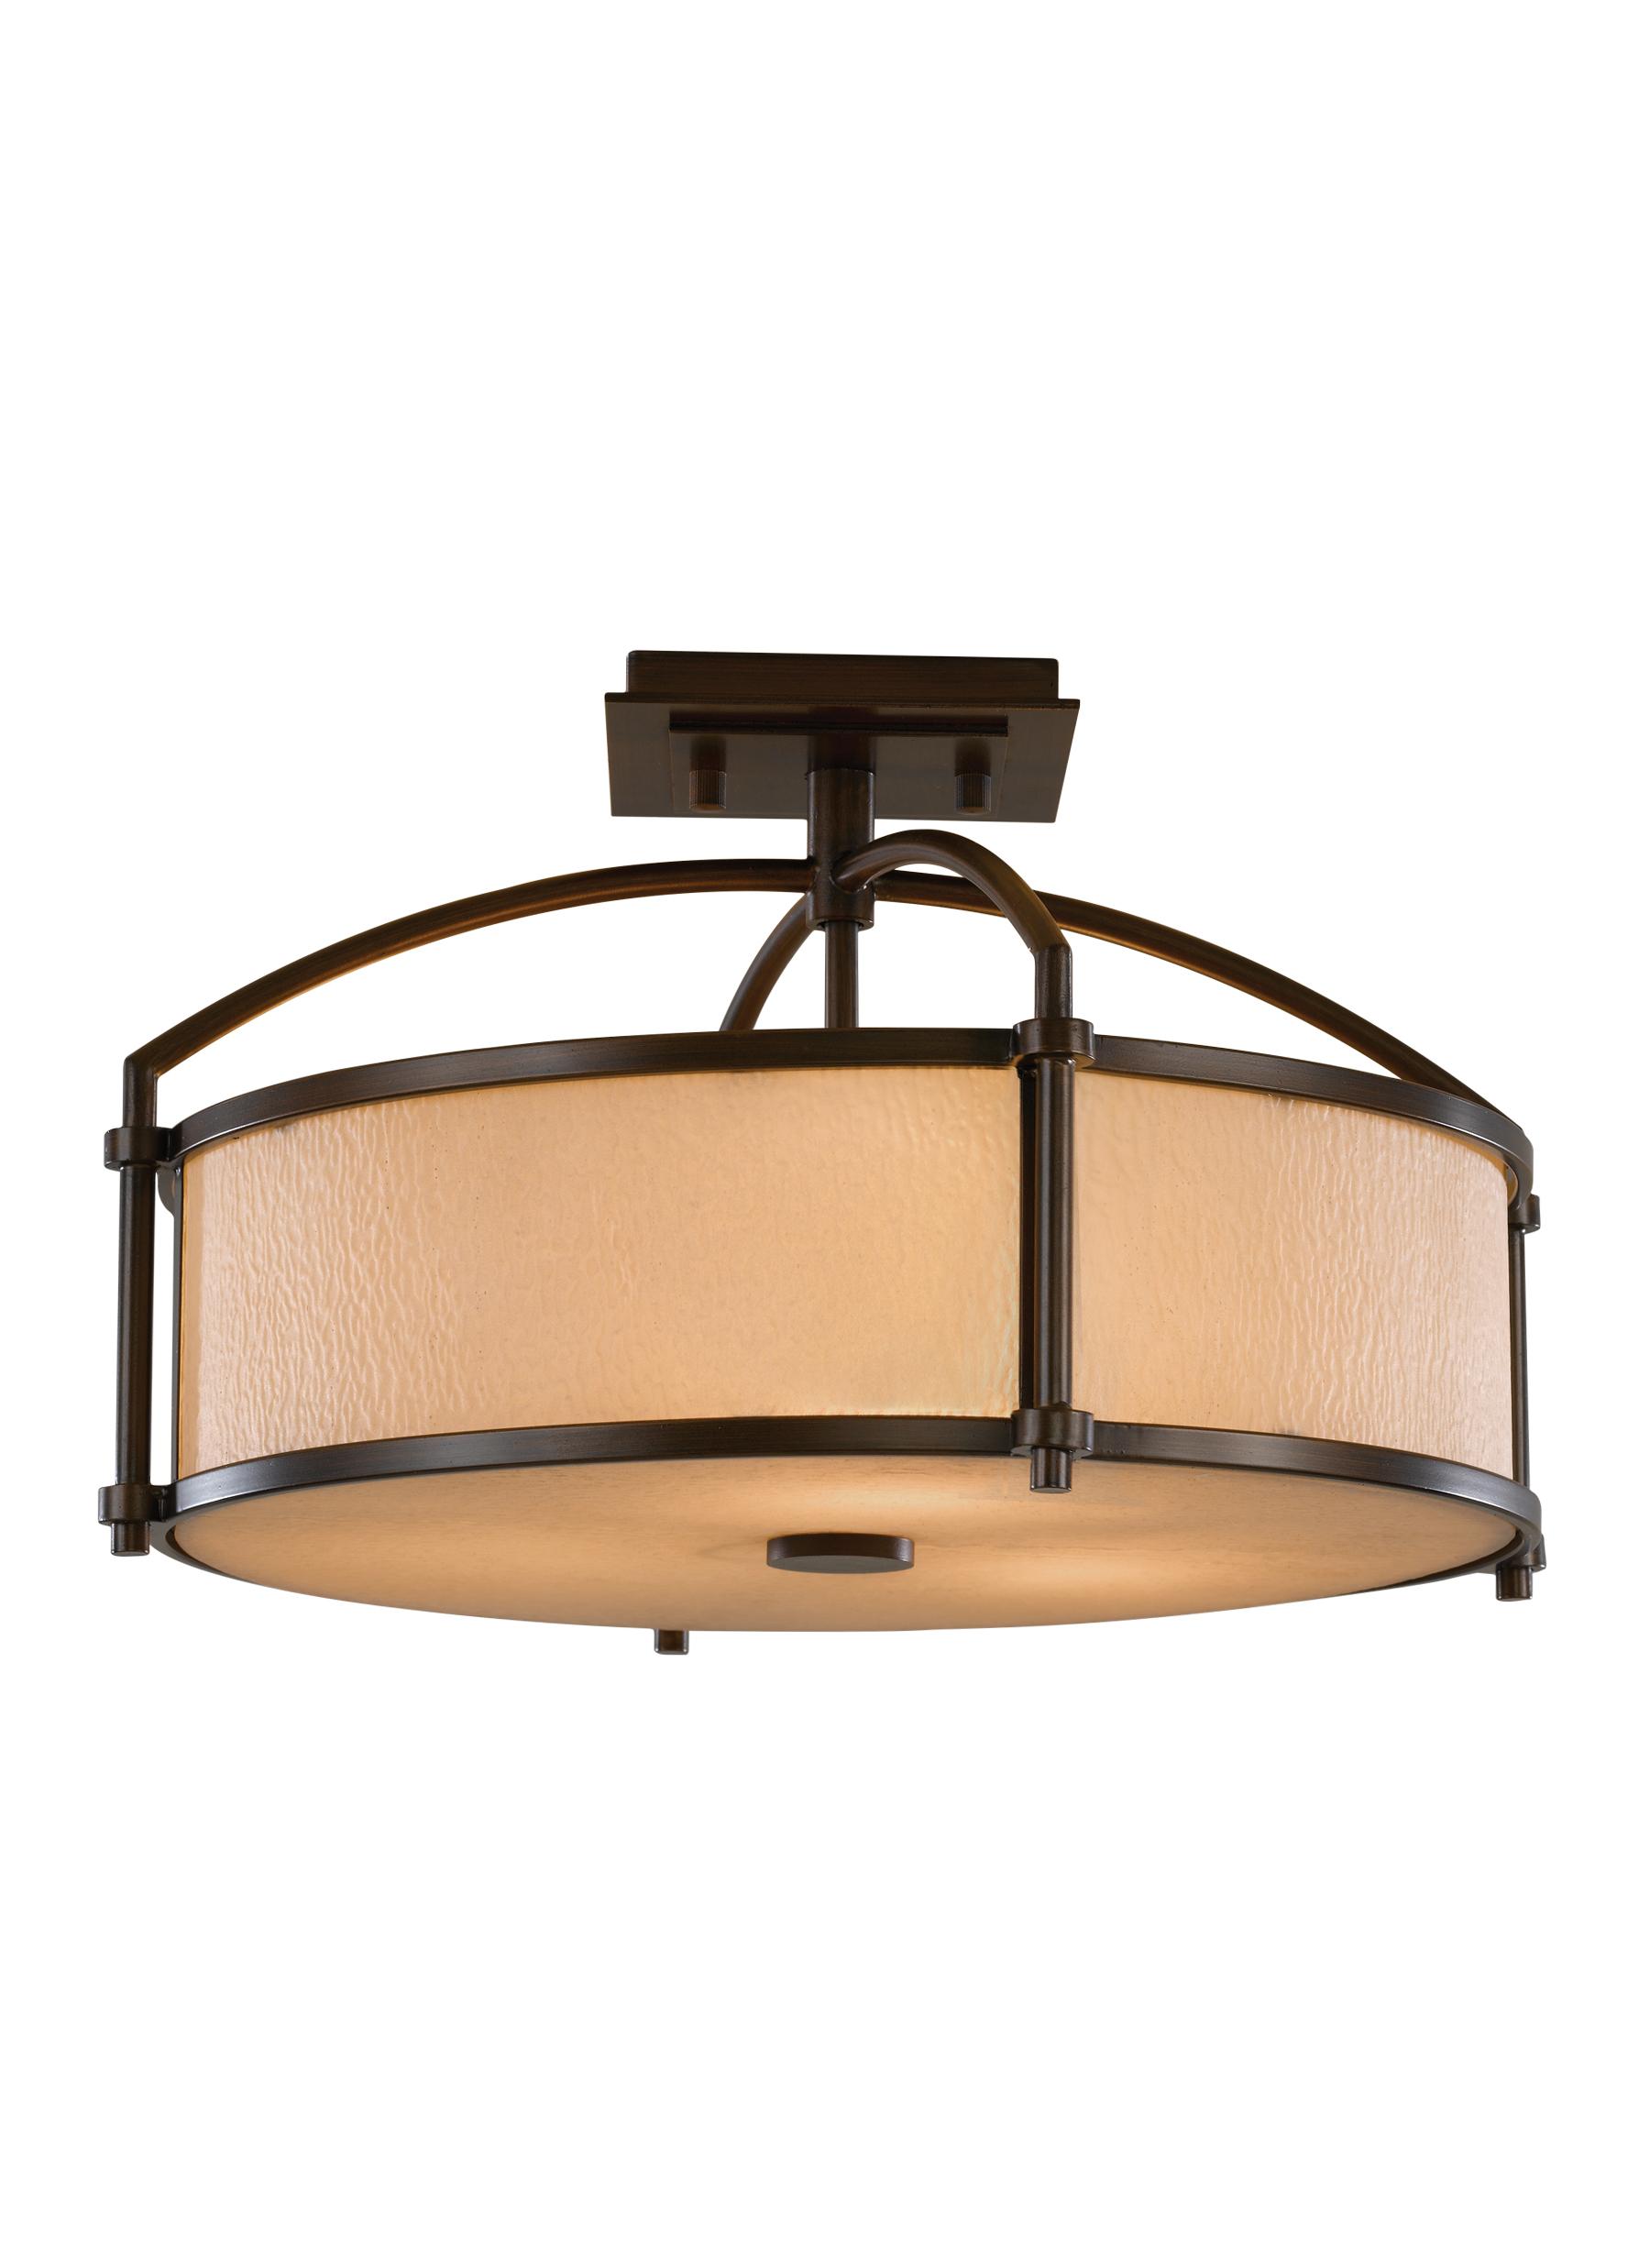 Preston Collection · 3 - Light Indoor Semi-Flush Mount  sc 1 st  Feiss & Preston Lighting Collection from Feiss azcodes.com